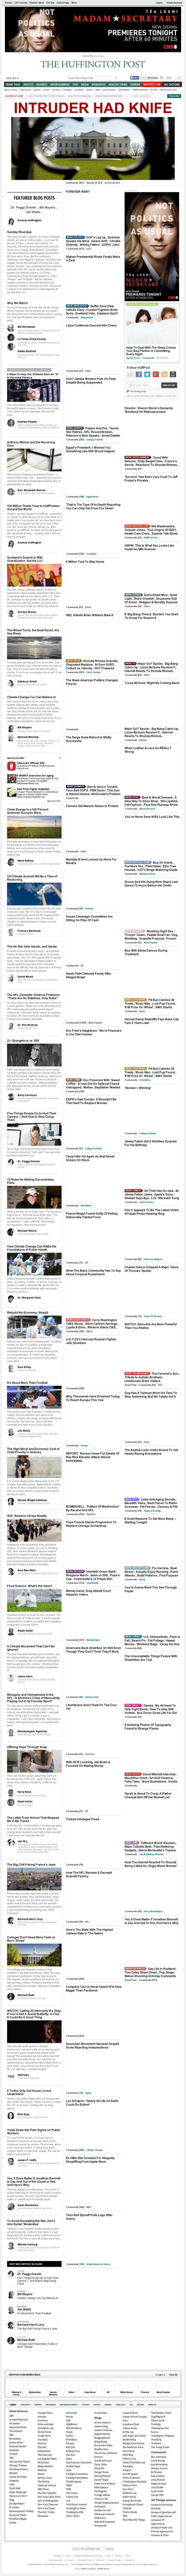 The Huffington Post at Sunday Sept. 21, 2014, 7:07 a.m. UTC